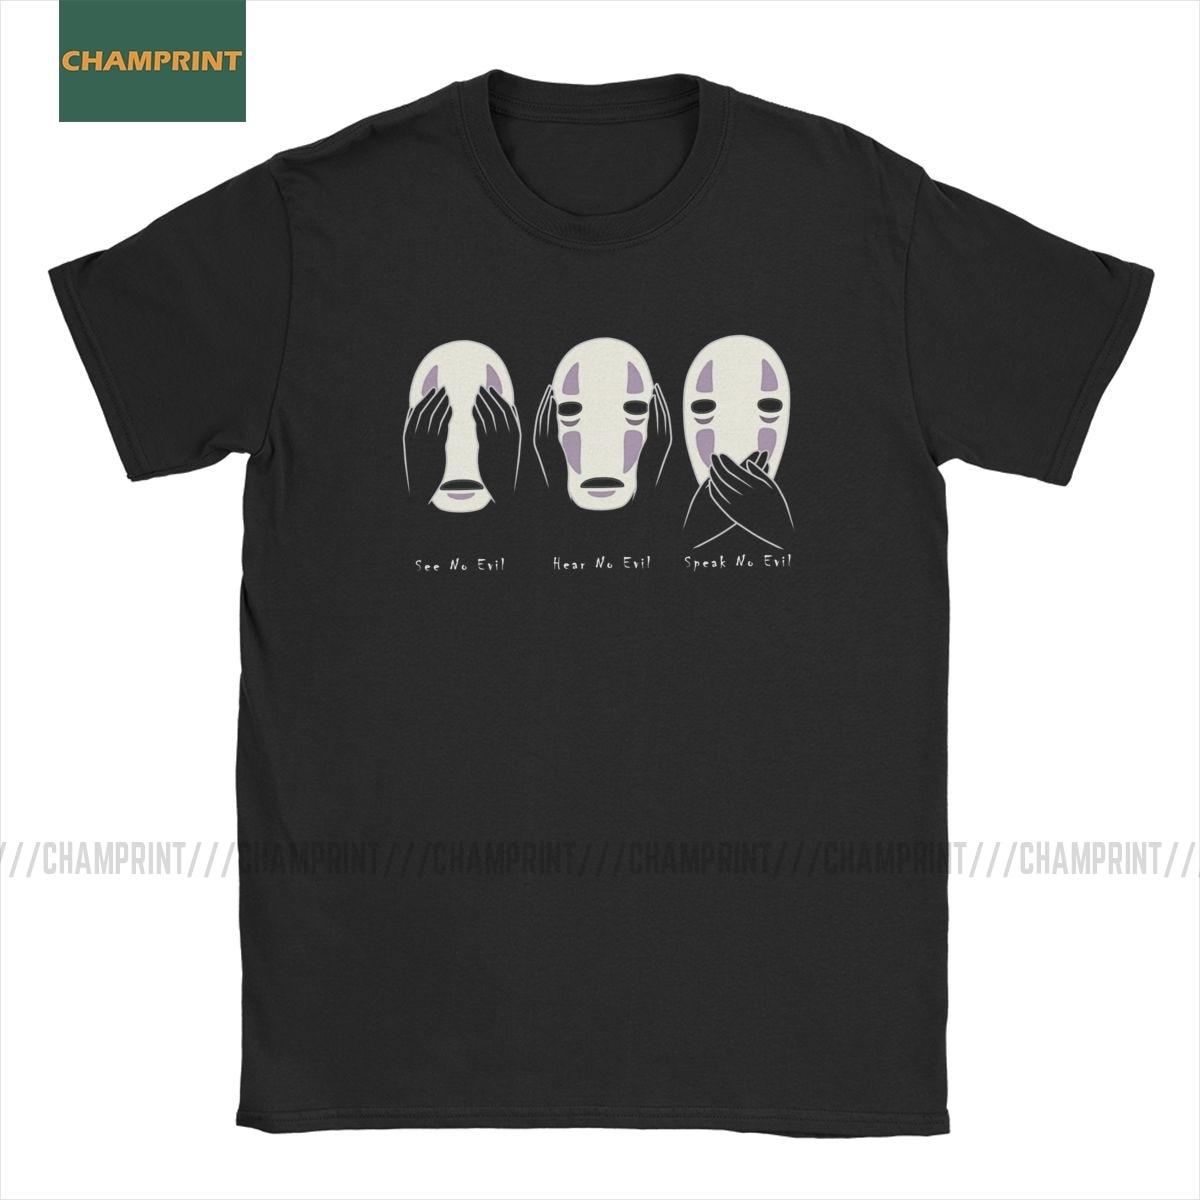 Camisetas para hombre Ghibli Haku Totoro Manga Miyazaki Hayao, camiseta de Manga corta de algodón de talla grande